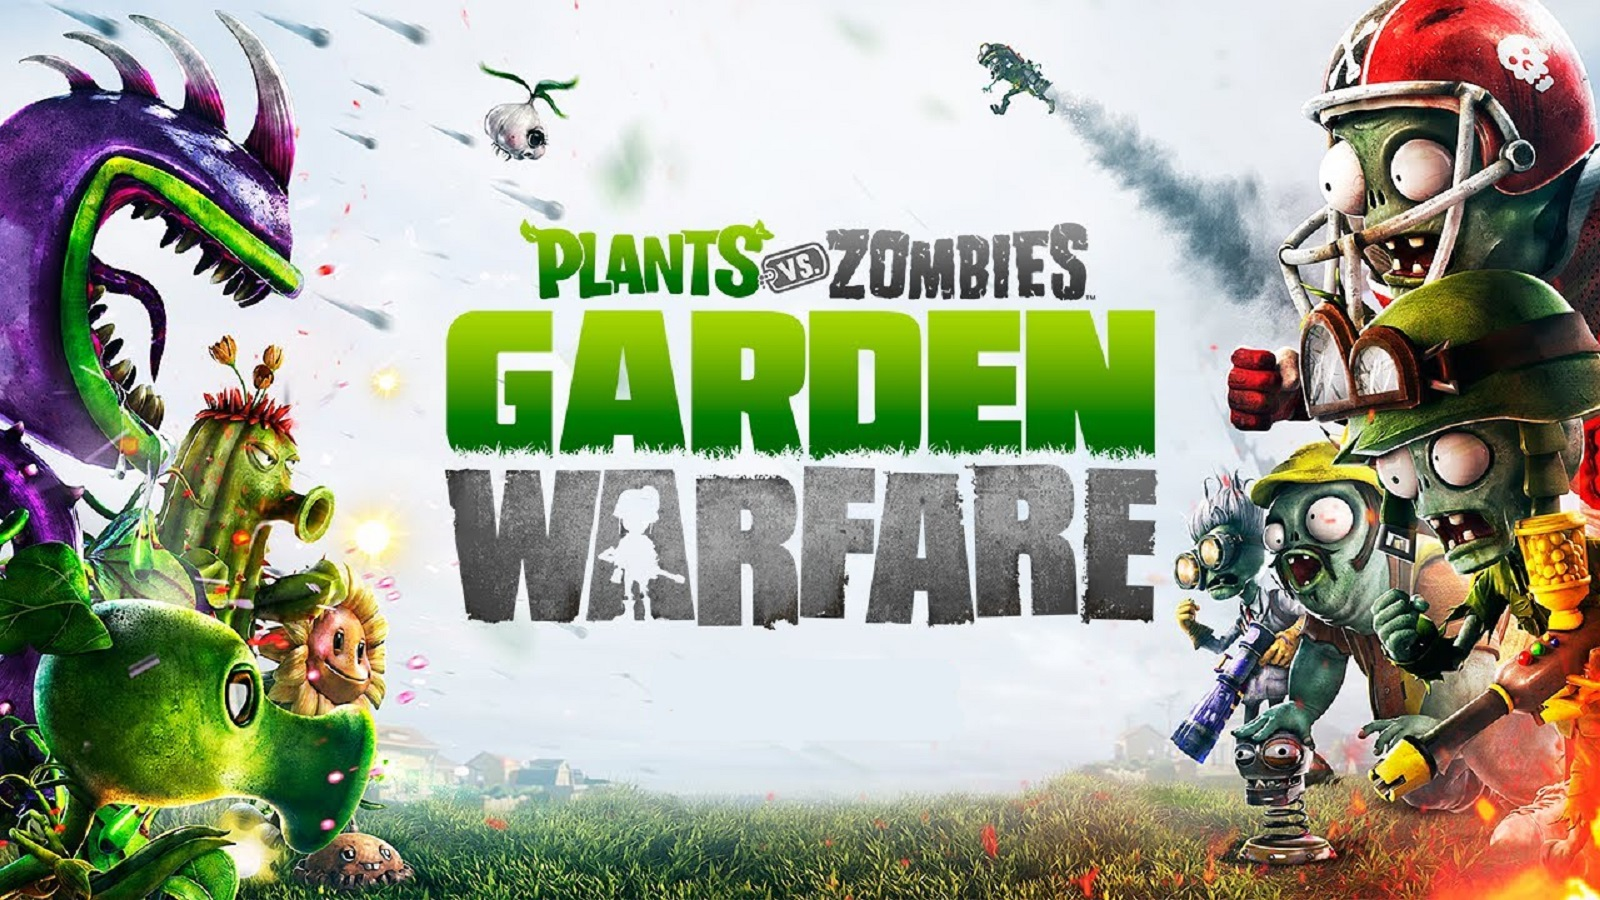 Plants Vs Zombies Garden Warfare Wallpaper Official Artwork